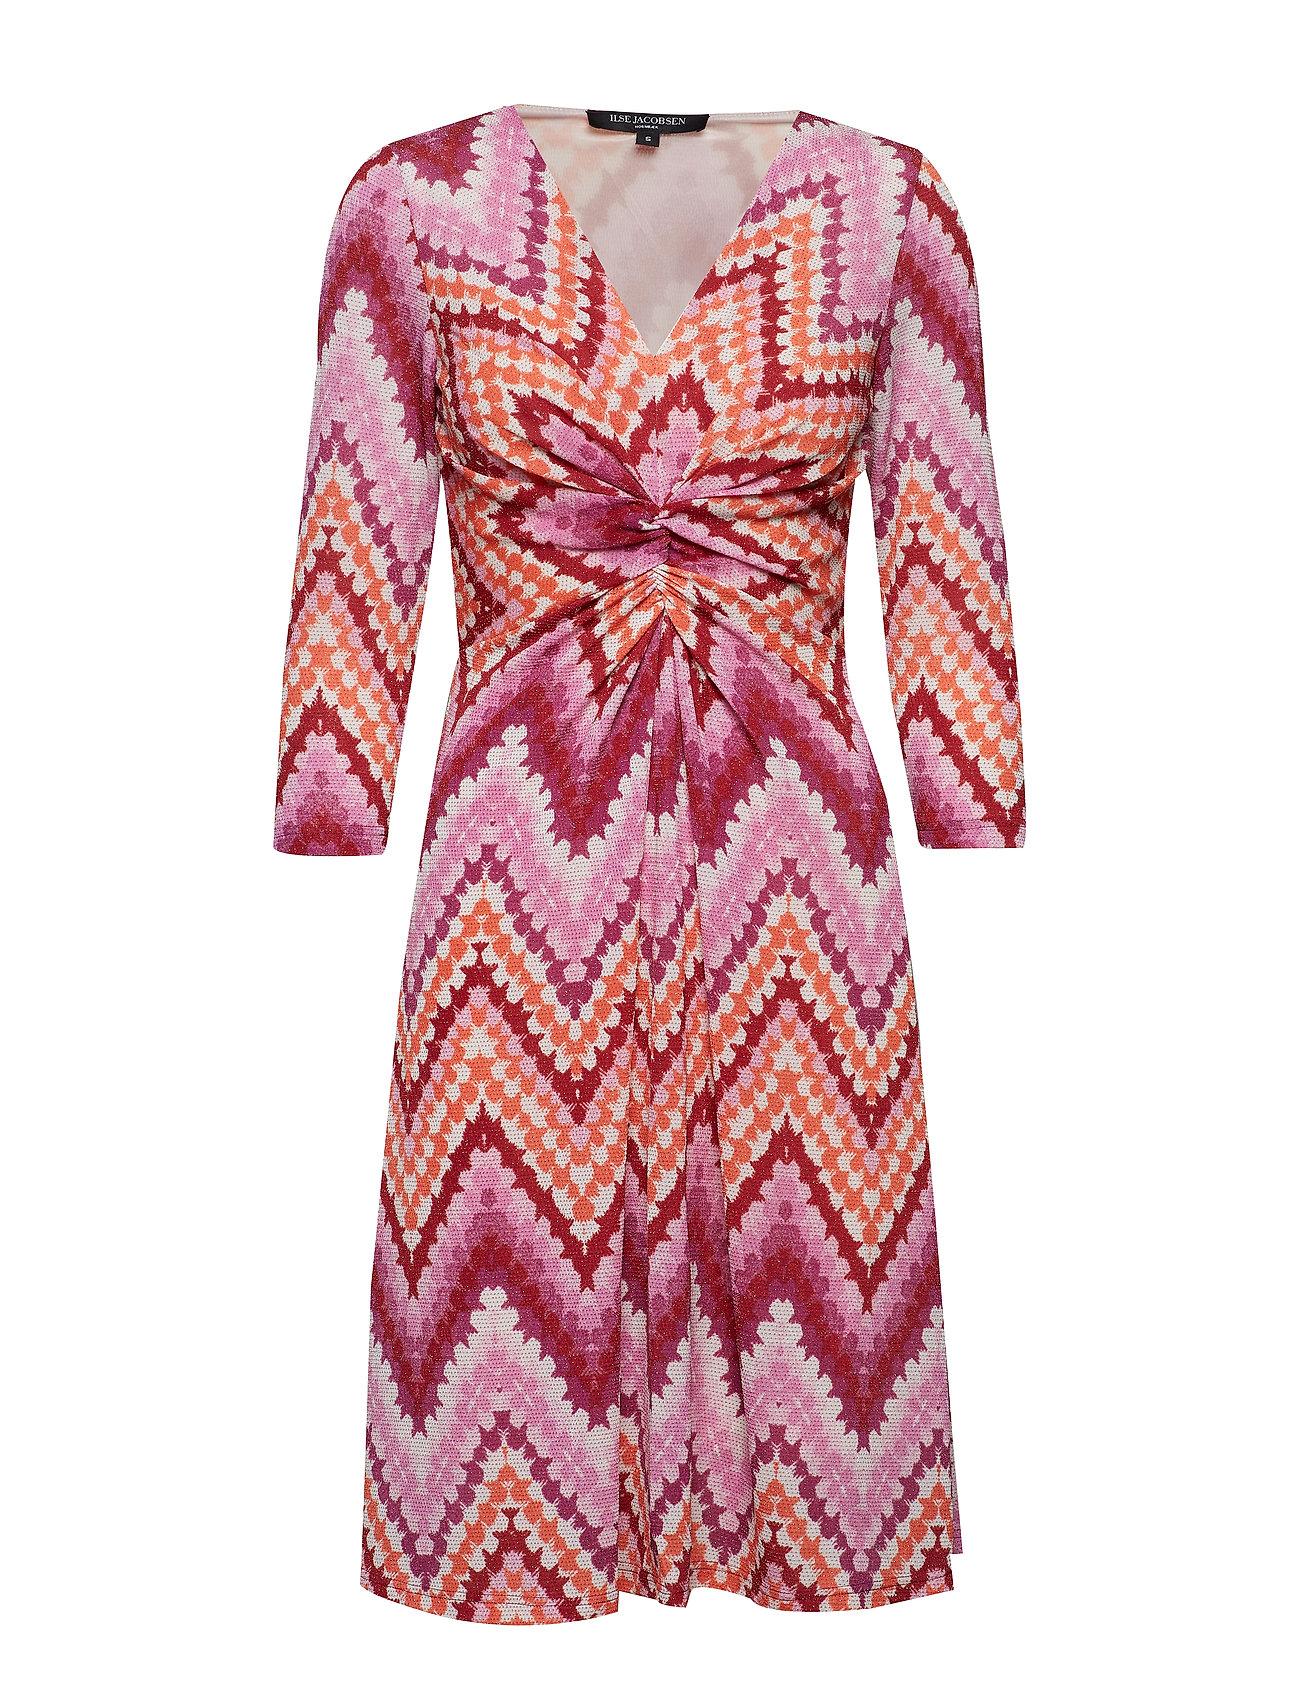 Image of Dress (3112982635)